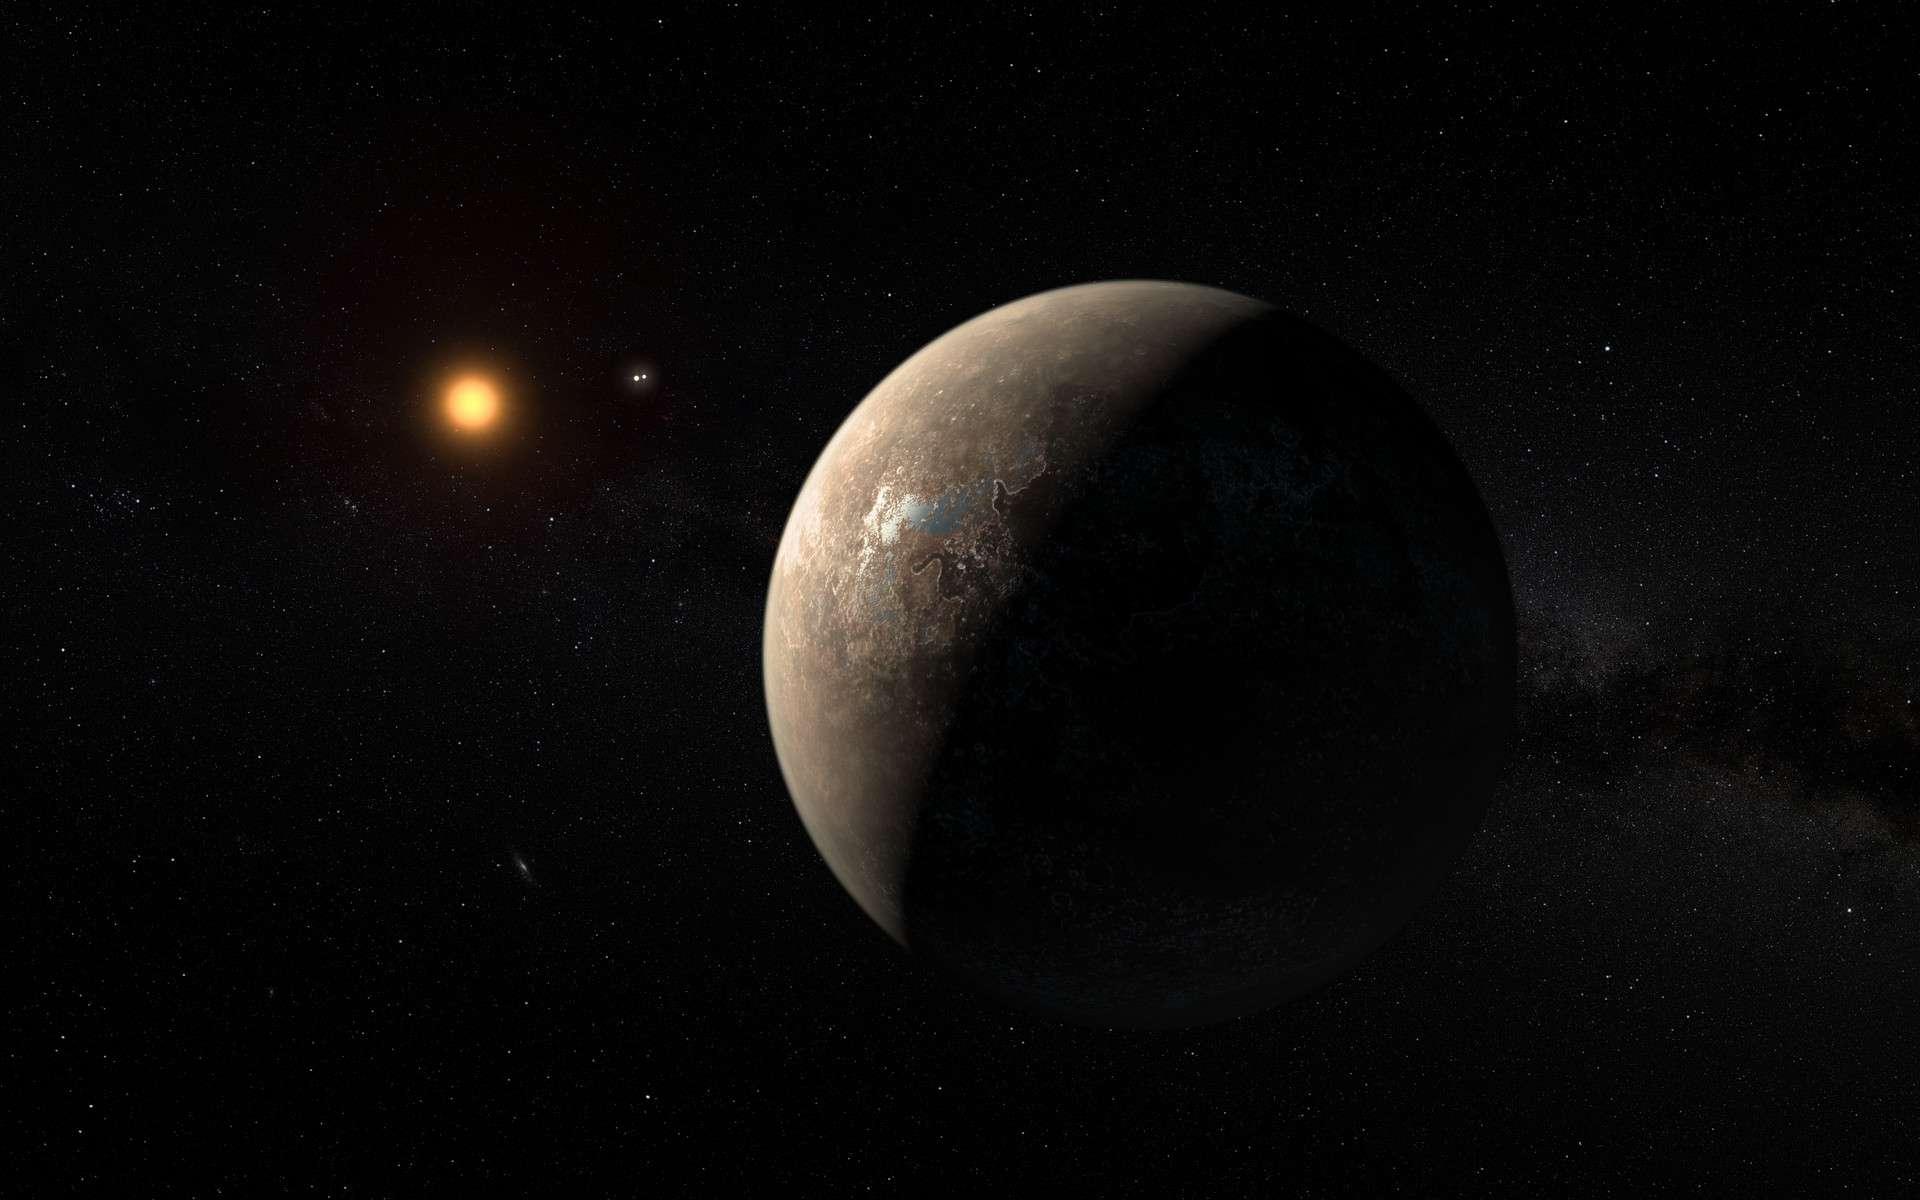 Illustration de Proxima b. © ESO, M. Kornmesser